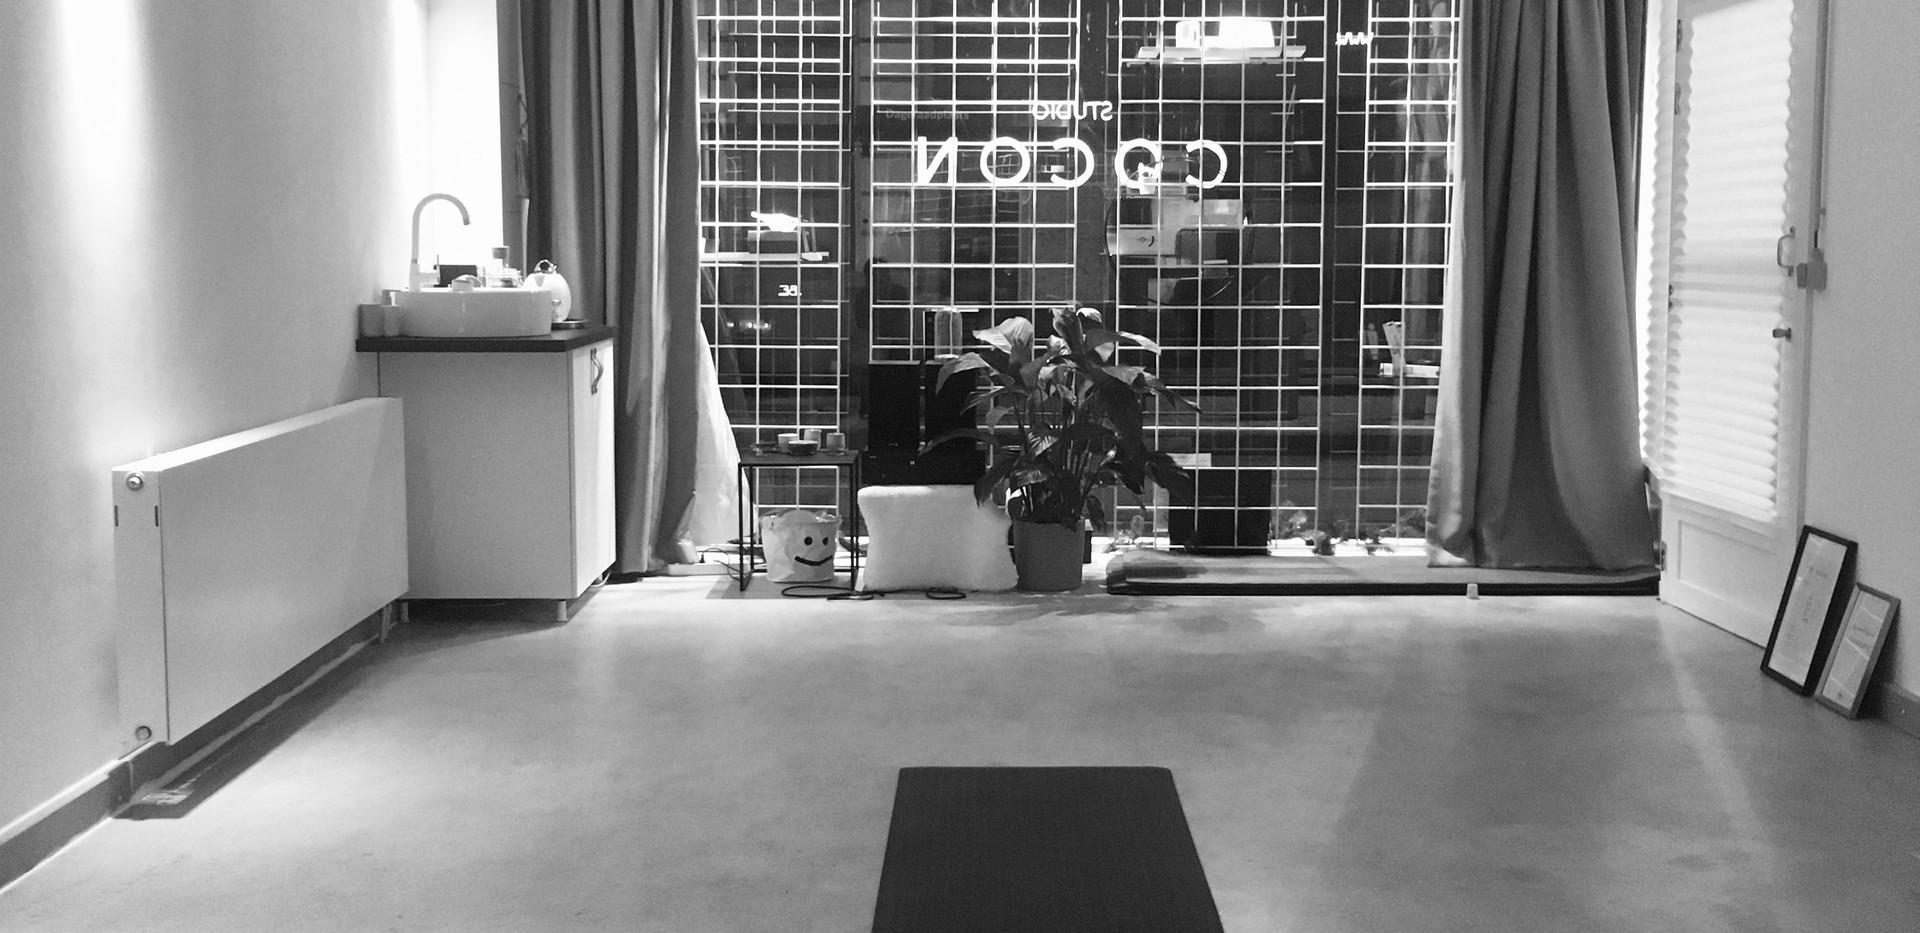 Studio Cocon: Hatha Yoga